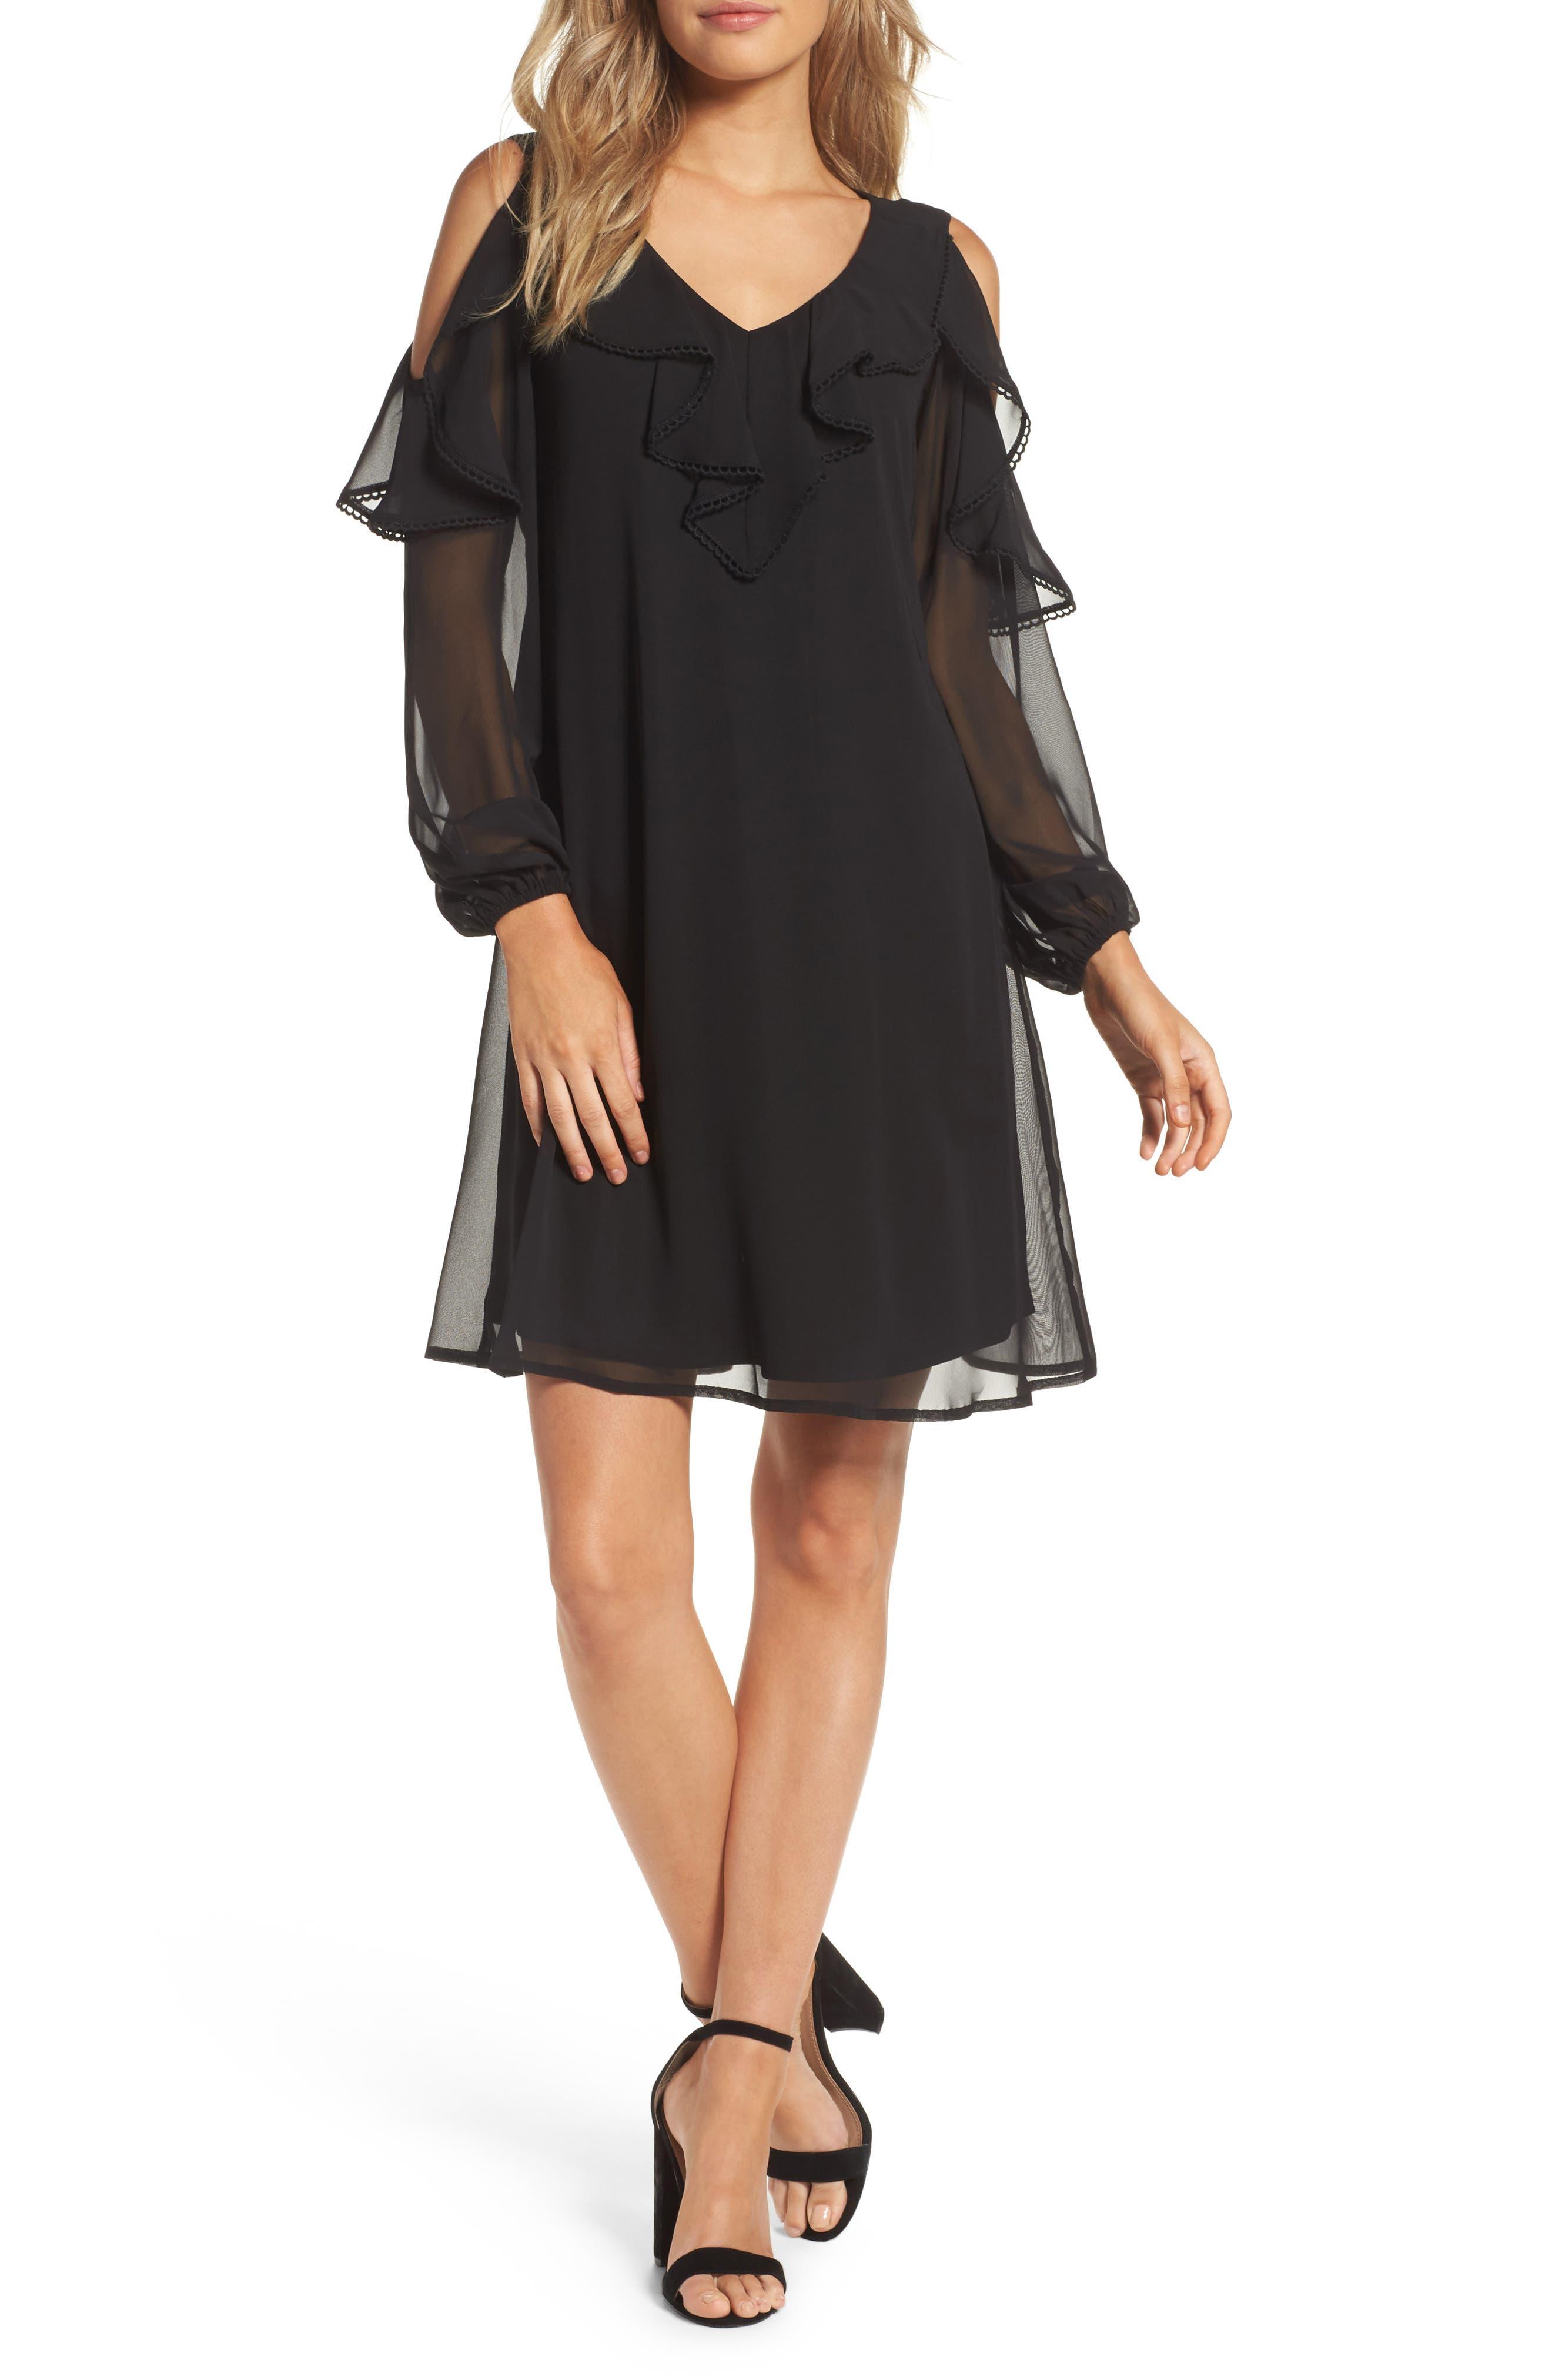 Taylor Dresses Chiffon Cold Shoulder A-Line Dress